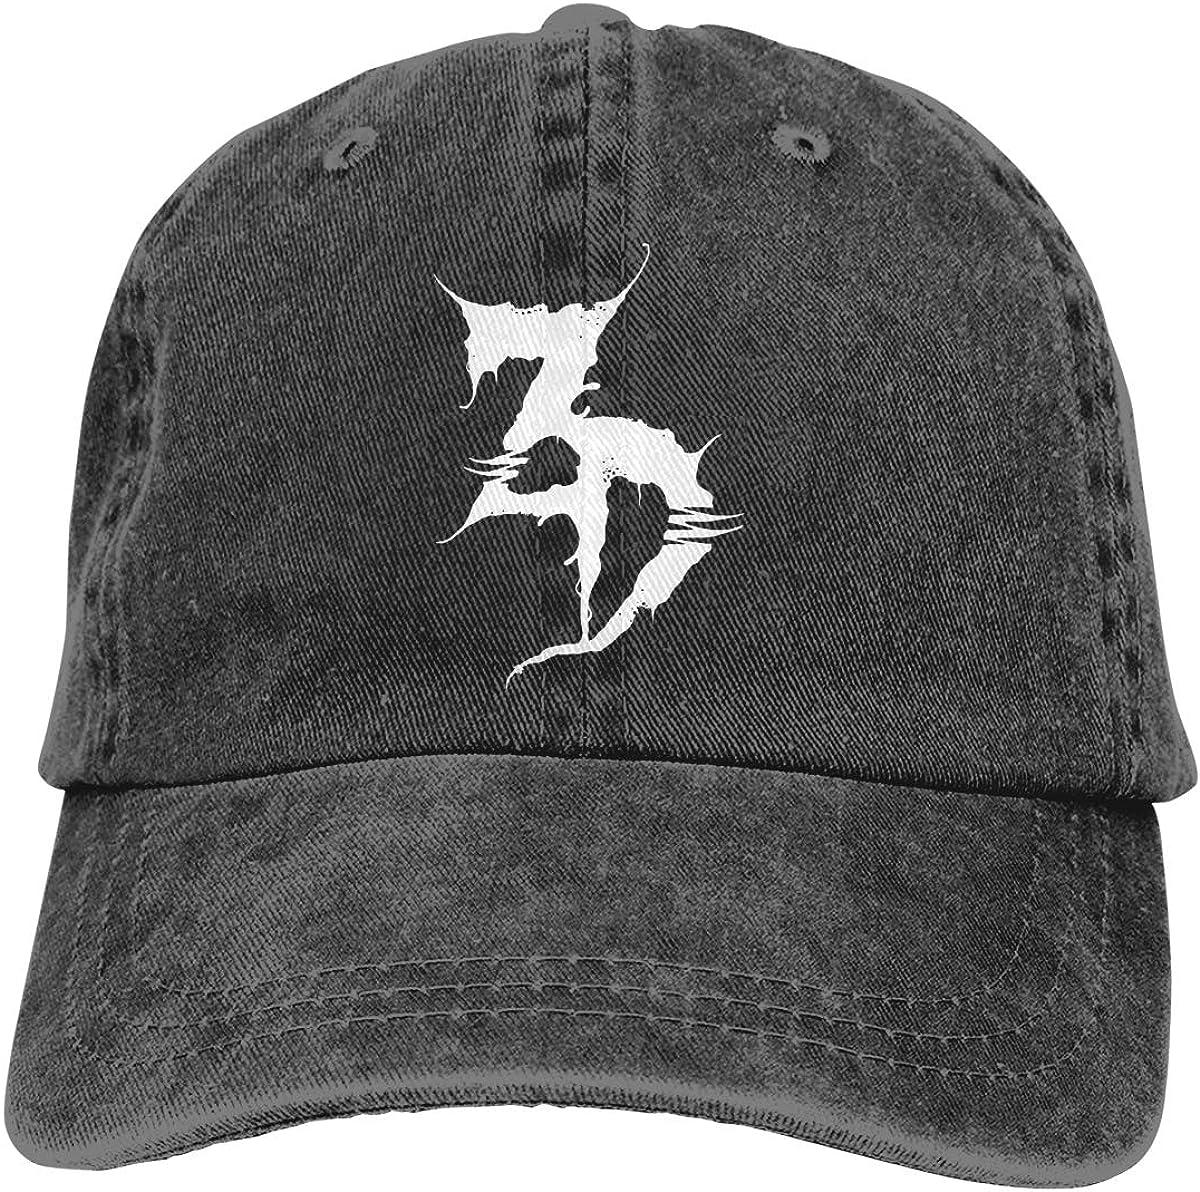 GingerDHallberg Zeds Dead Hats Washed Adjustable Cowboy Max 70% OFF Deni Omaha Mall Hat